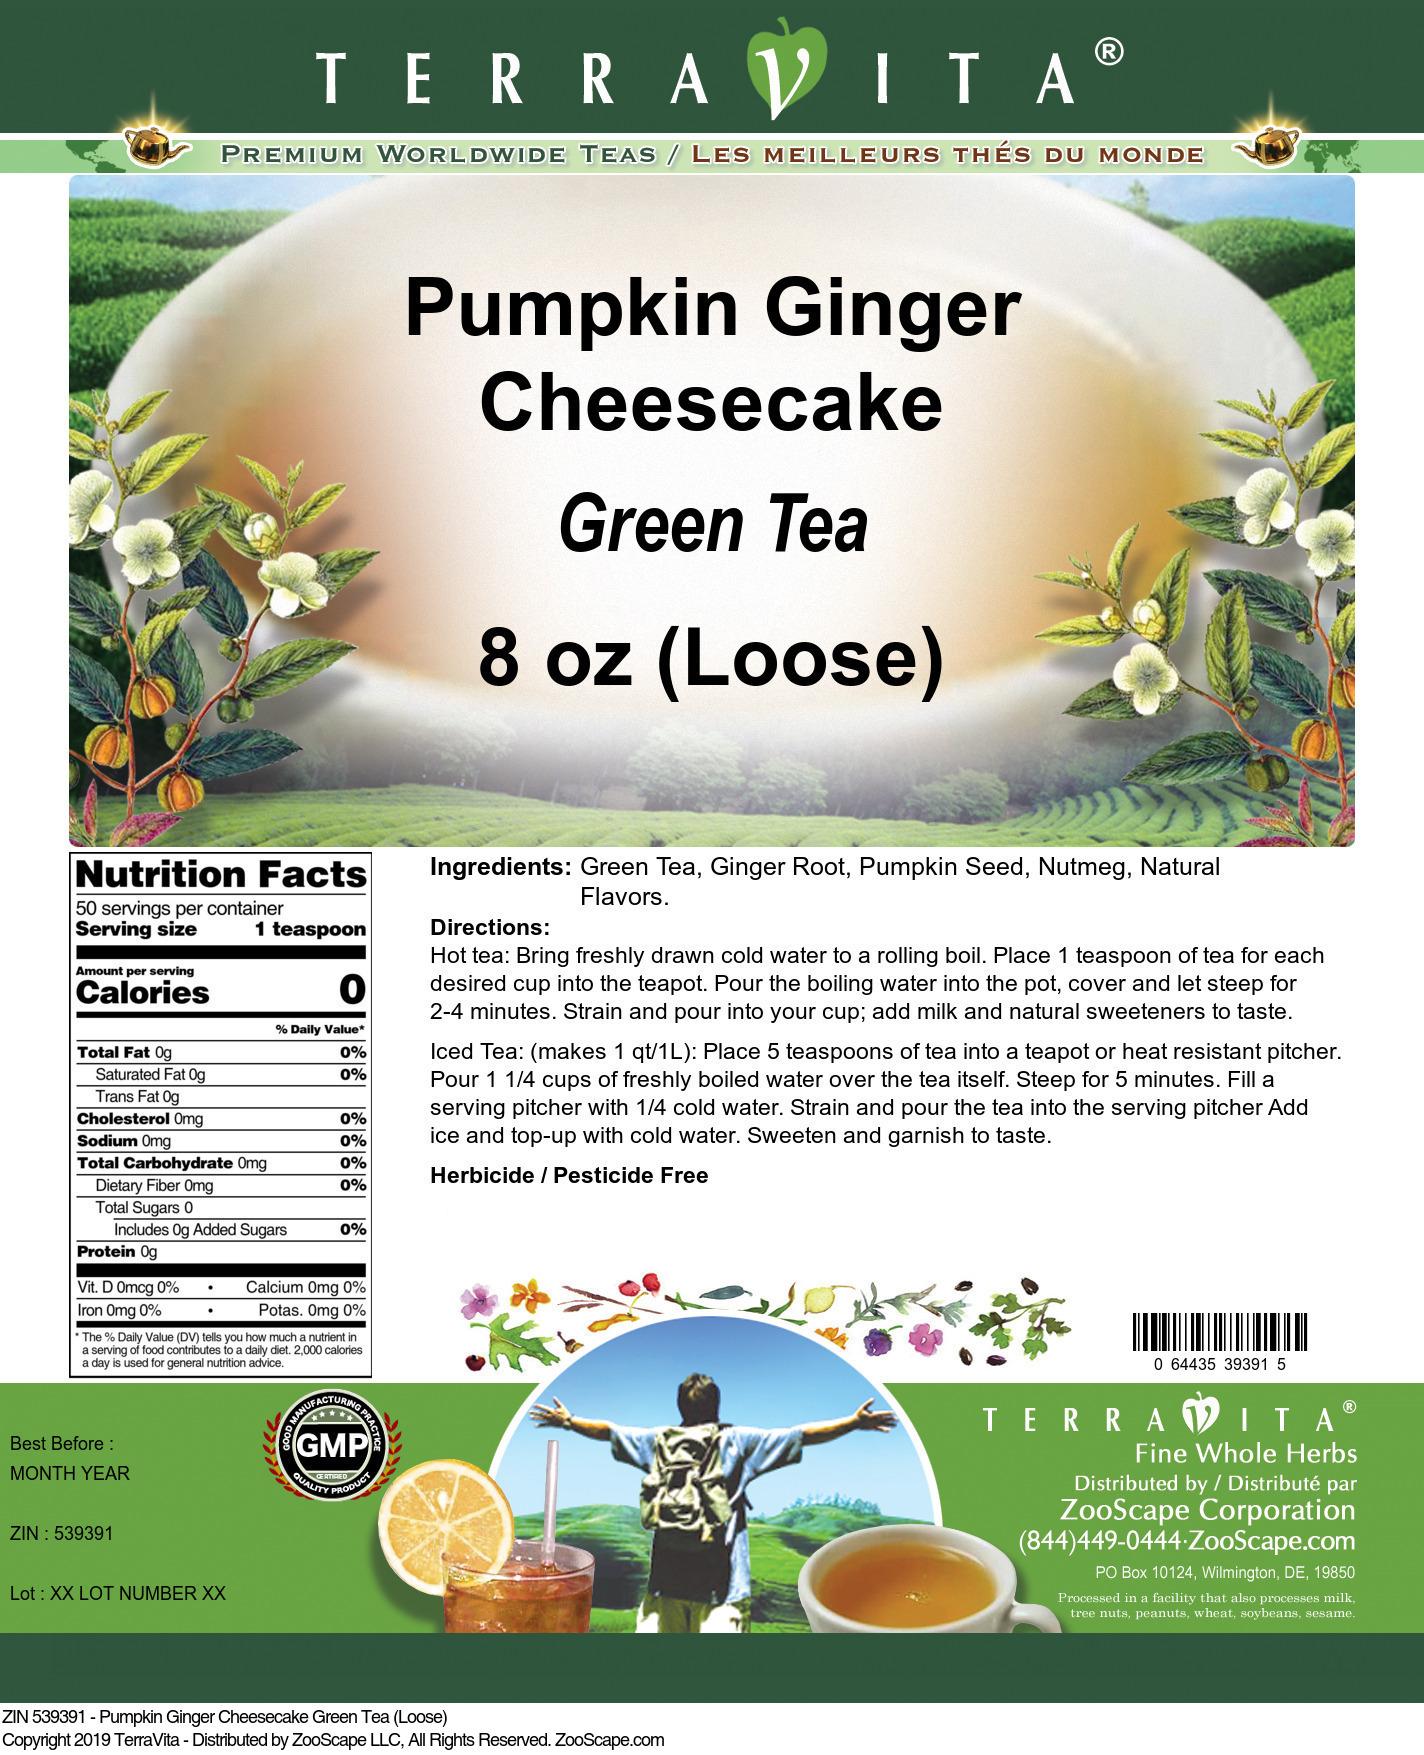 Pumpkin Ginger Cheesecake Green Tea (Loose)